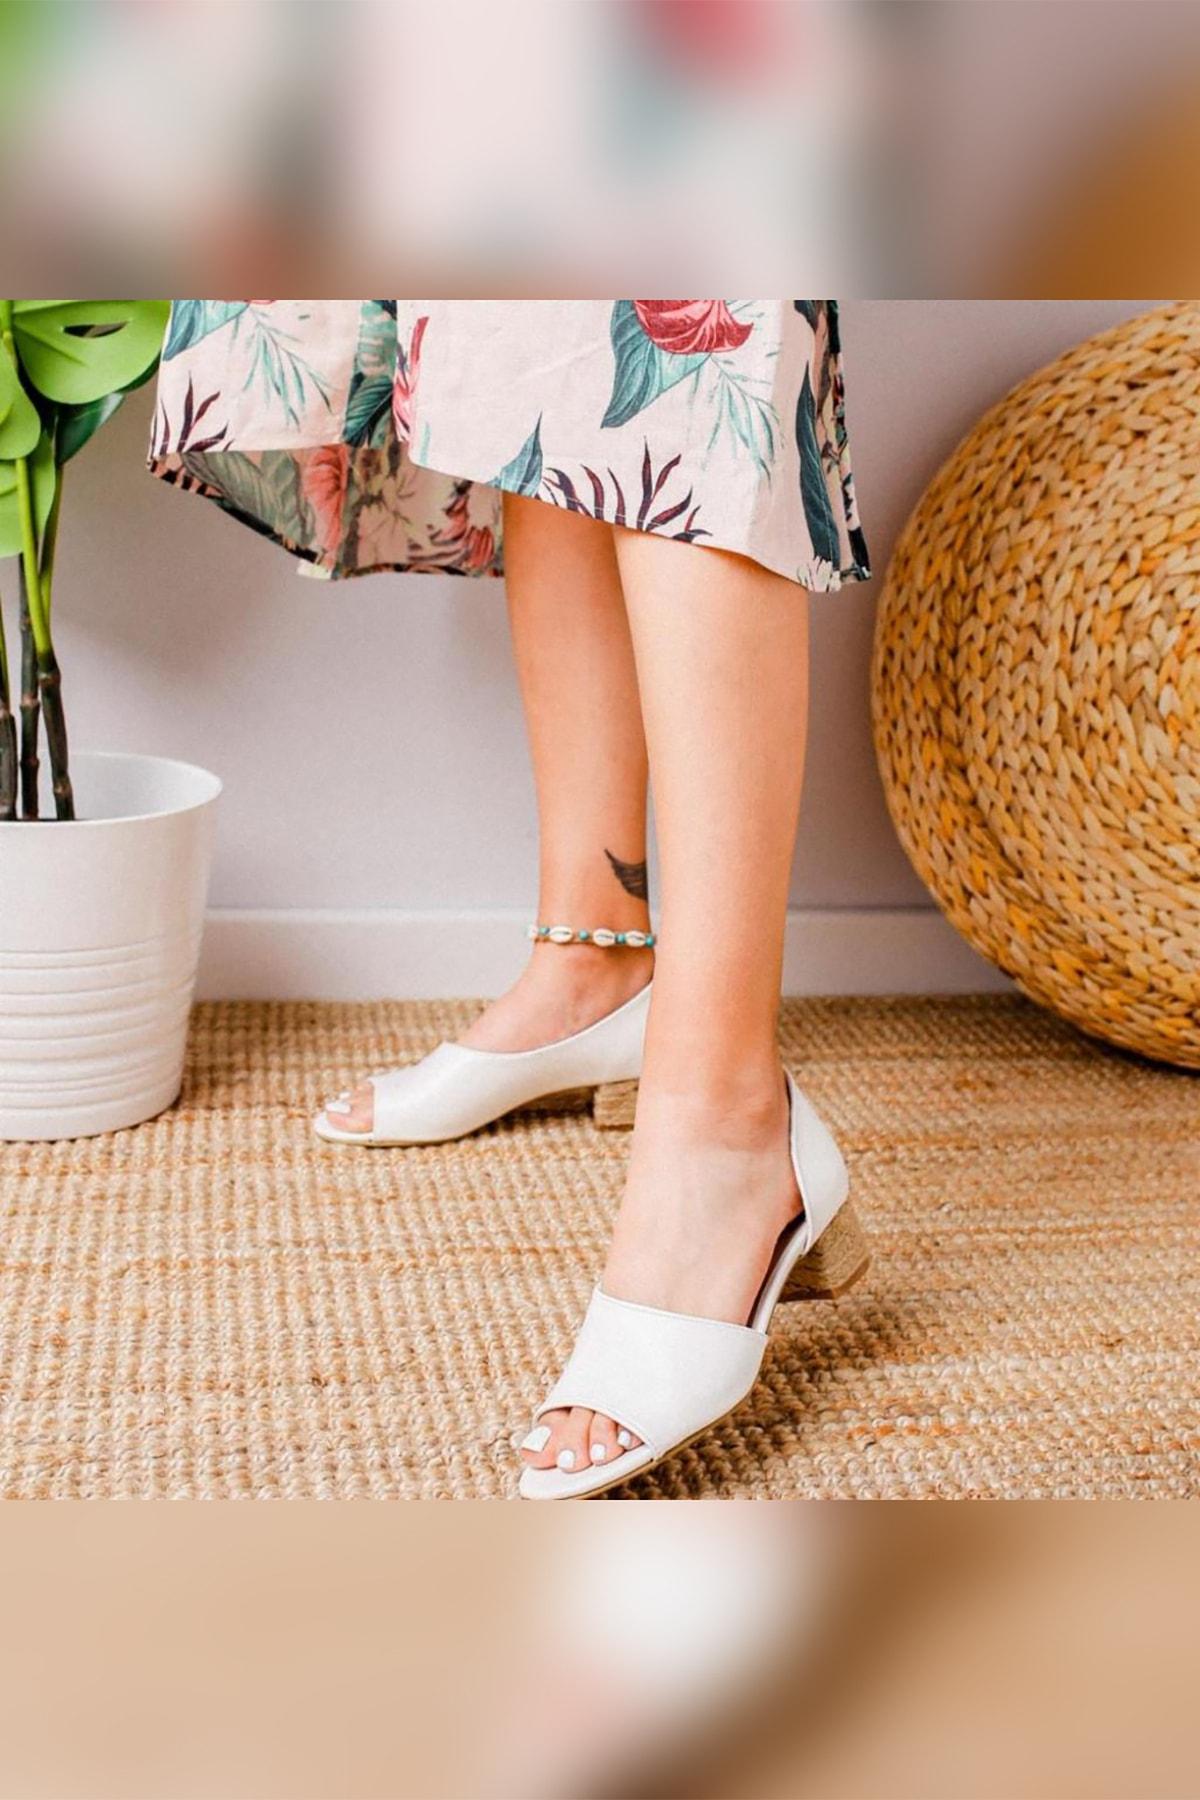 Limoya Kacie Beyaz Alçak Hasır Topuklu Sandalet 1